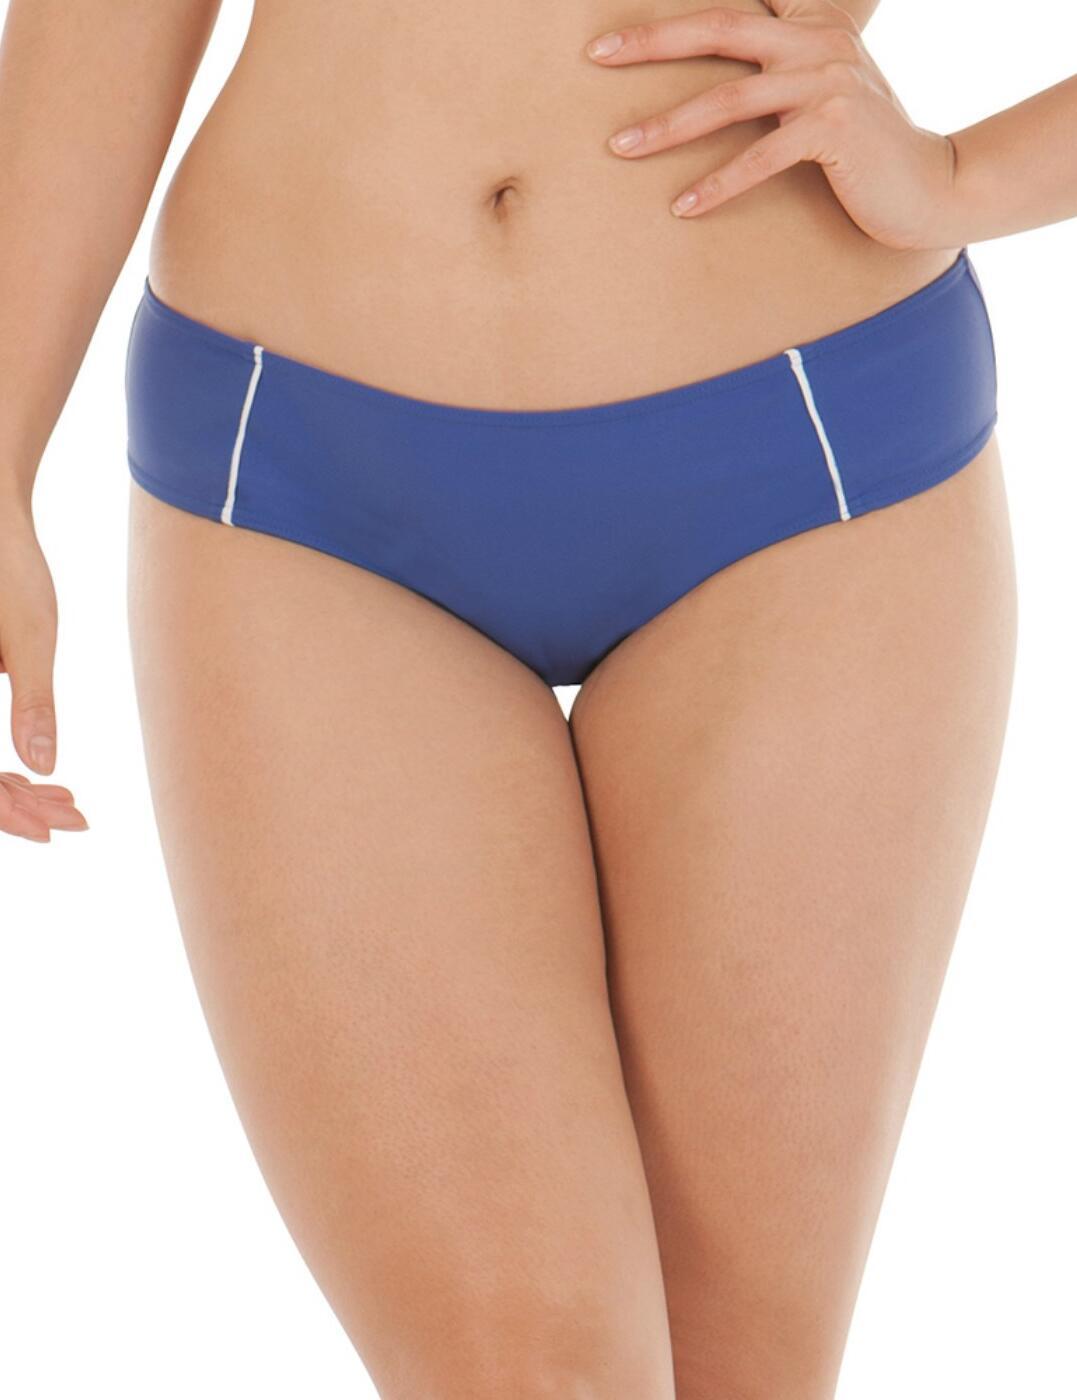 4503 Curvy Kate Sail Away Cheeky Bikini Short - 4503 Blue/White